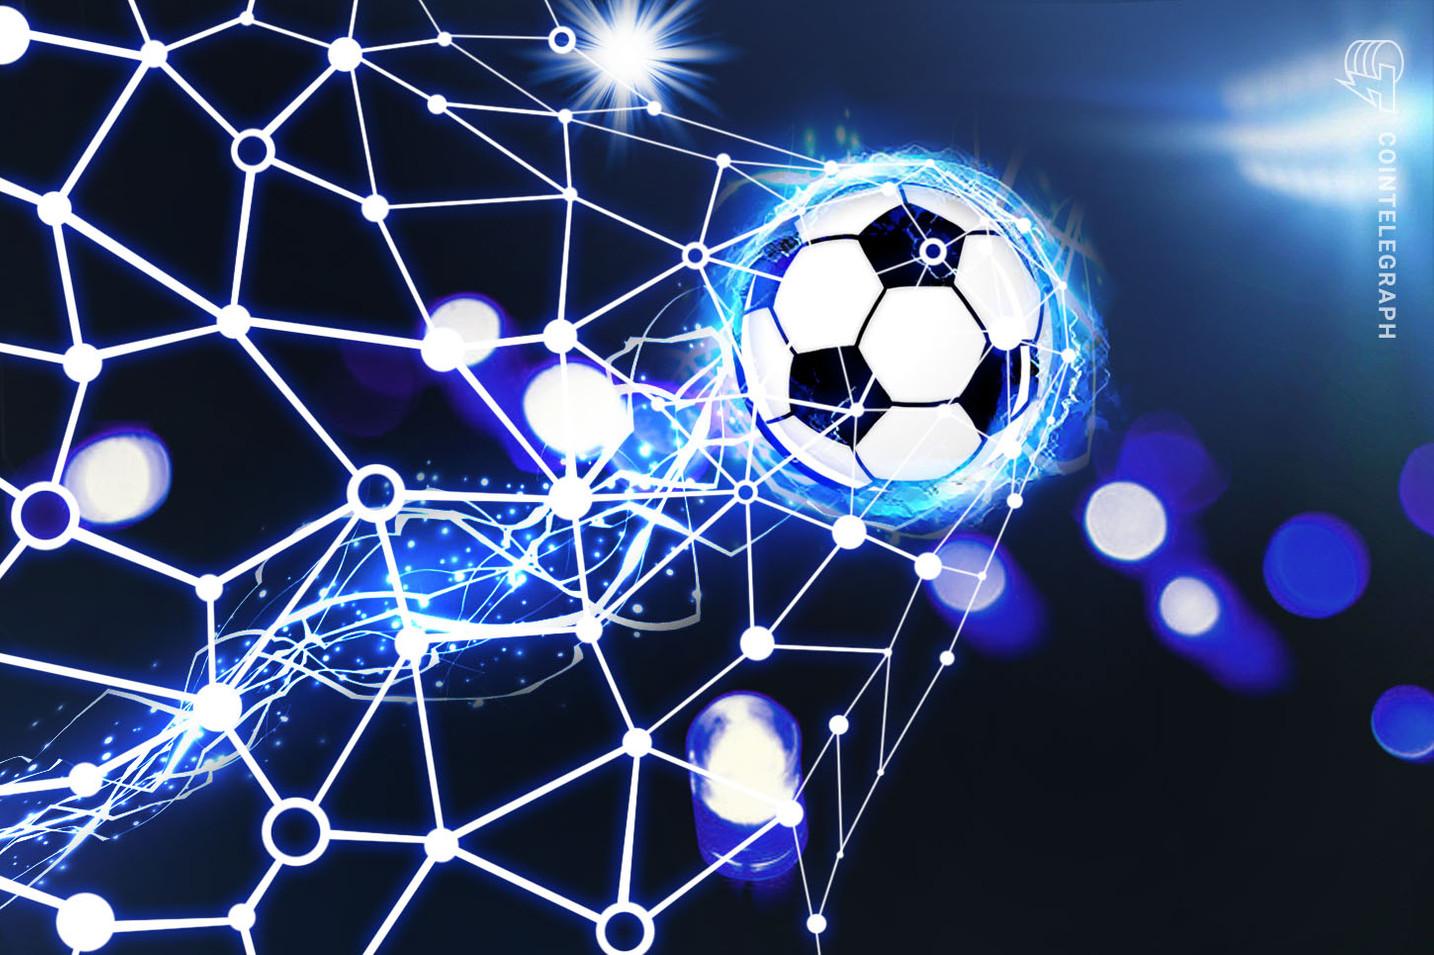 AC Milan employs blockchain to reach 450 million fans amid COVID lockdowns